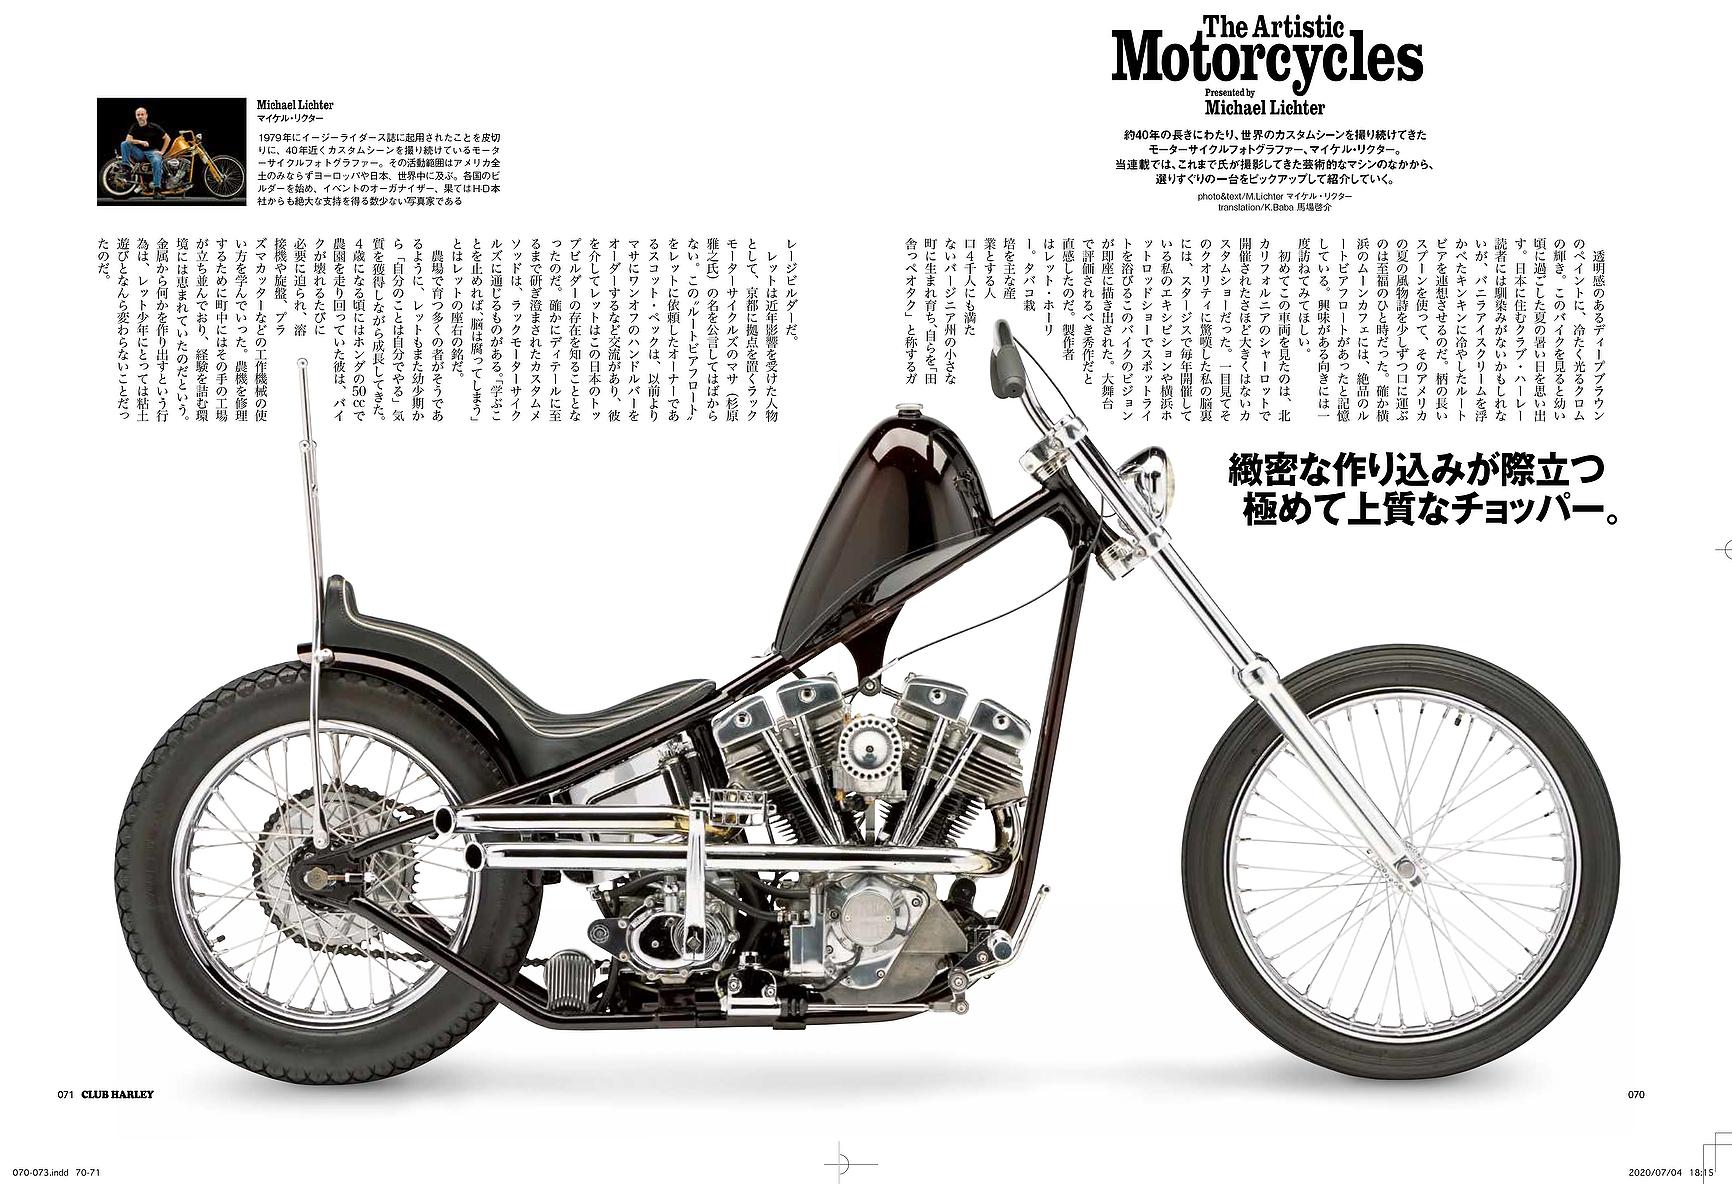 Rhett Holley, Shovelhead, Michael Lichter Motorcycle Photography